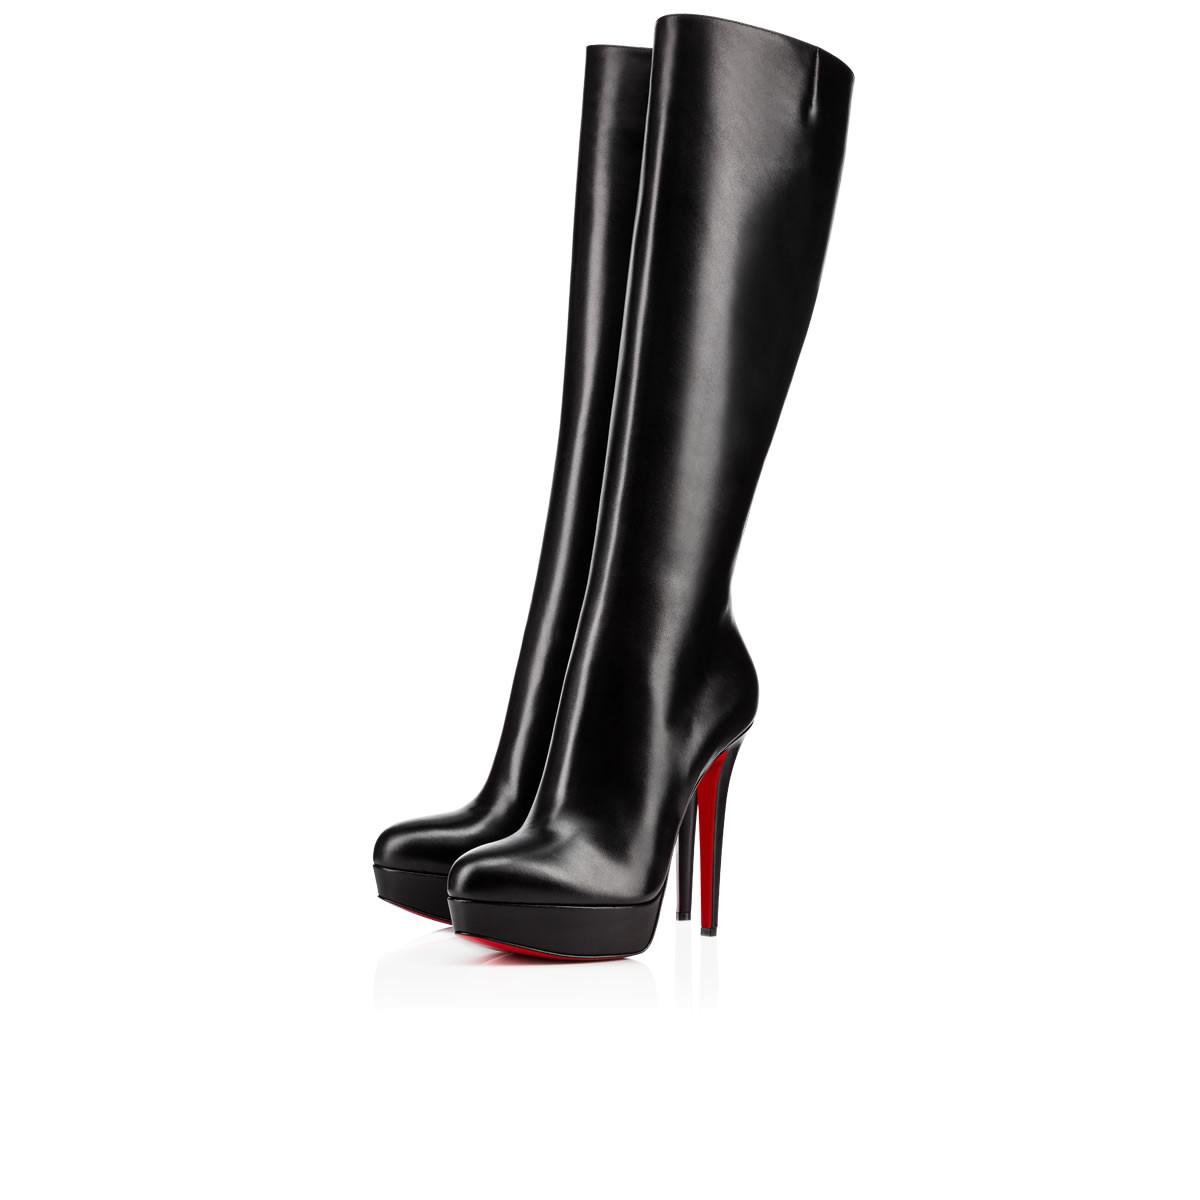 c07893574fb Bianca Botta Platform Red Sole Boot, Black